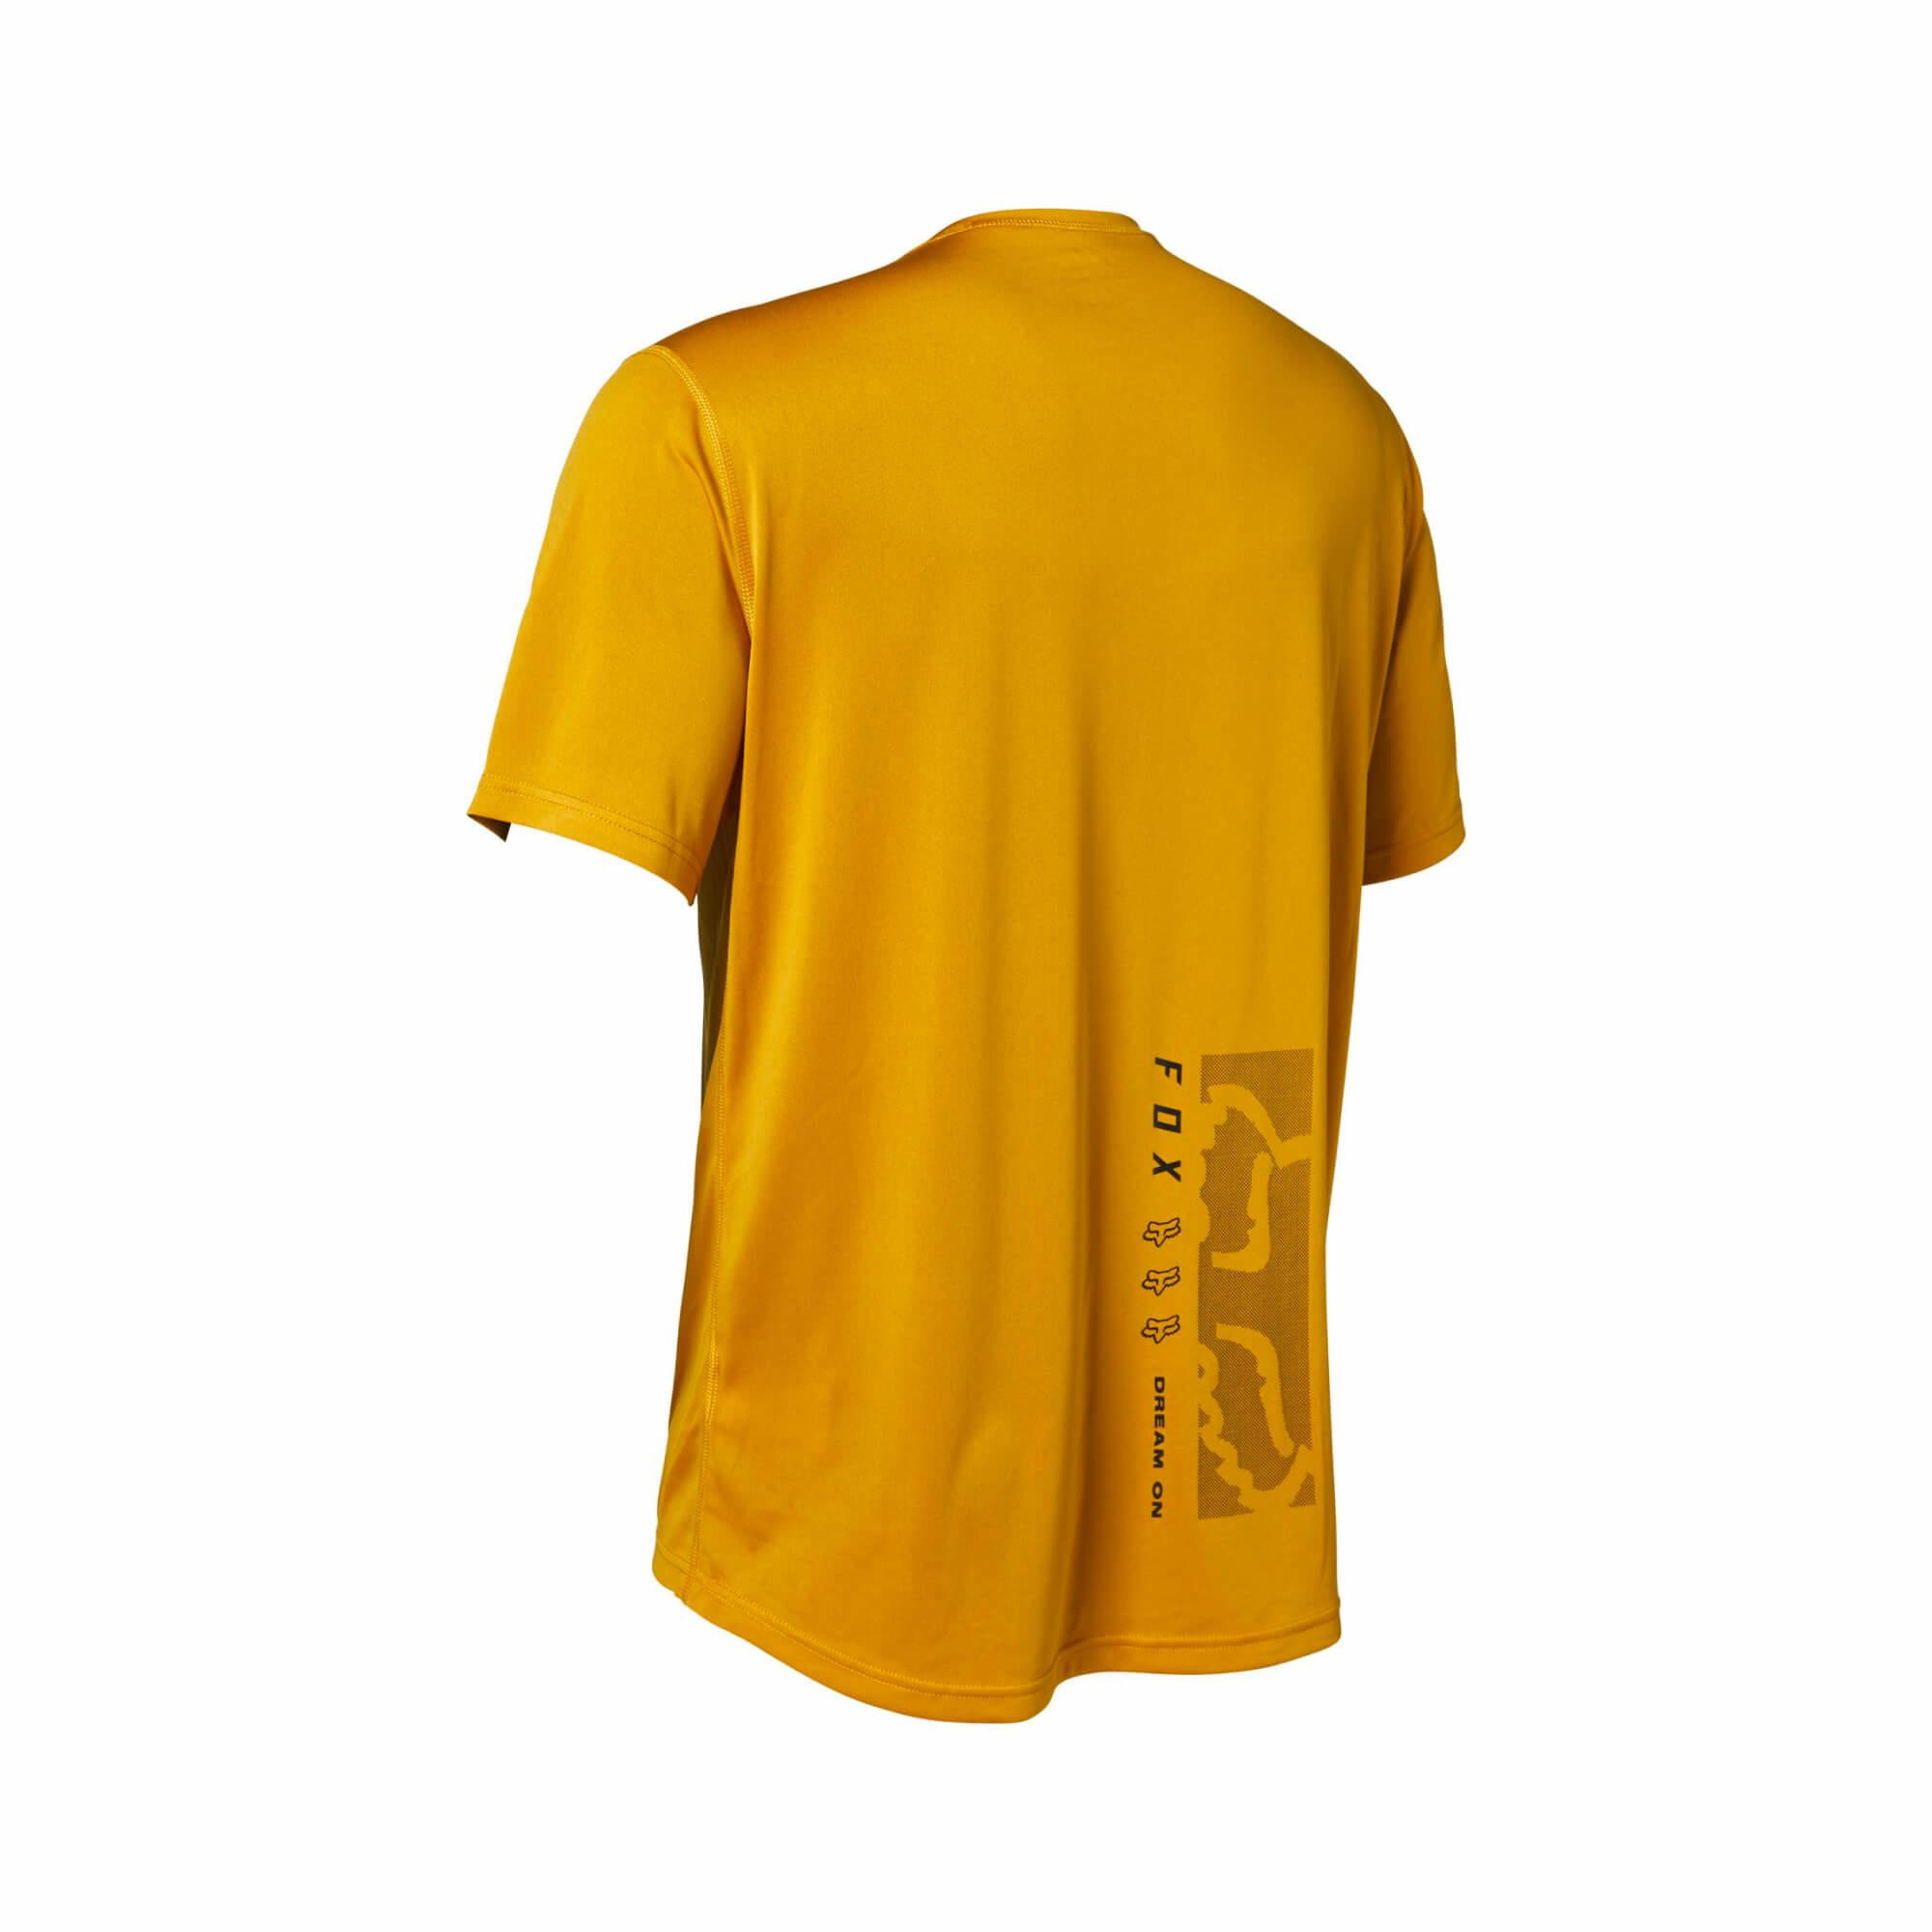 Ranger Short Sleeve Jersey Graphic 2 2021-3